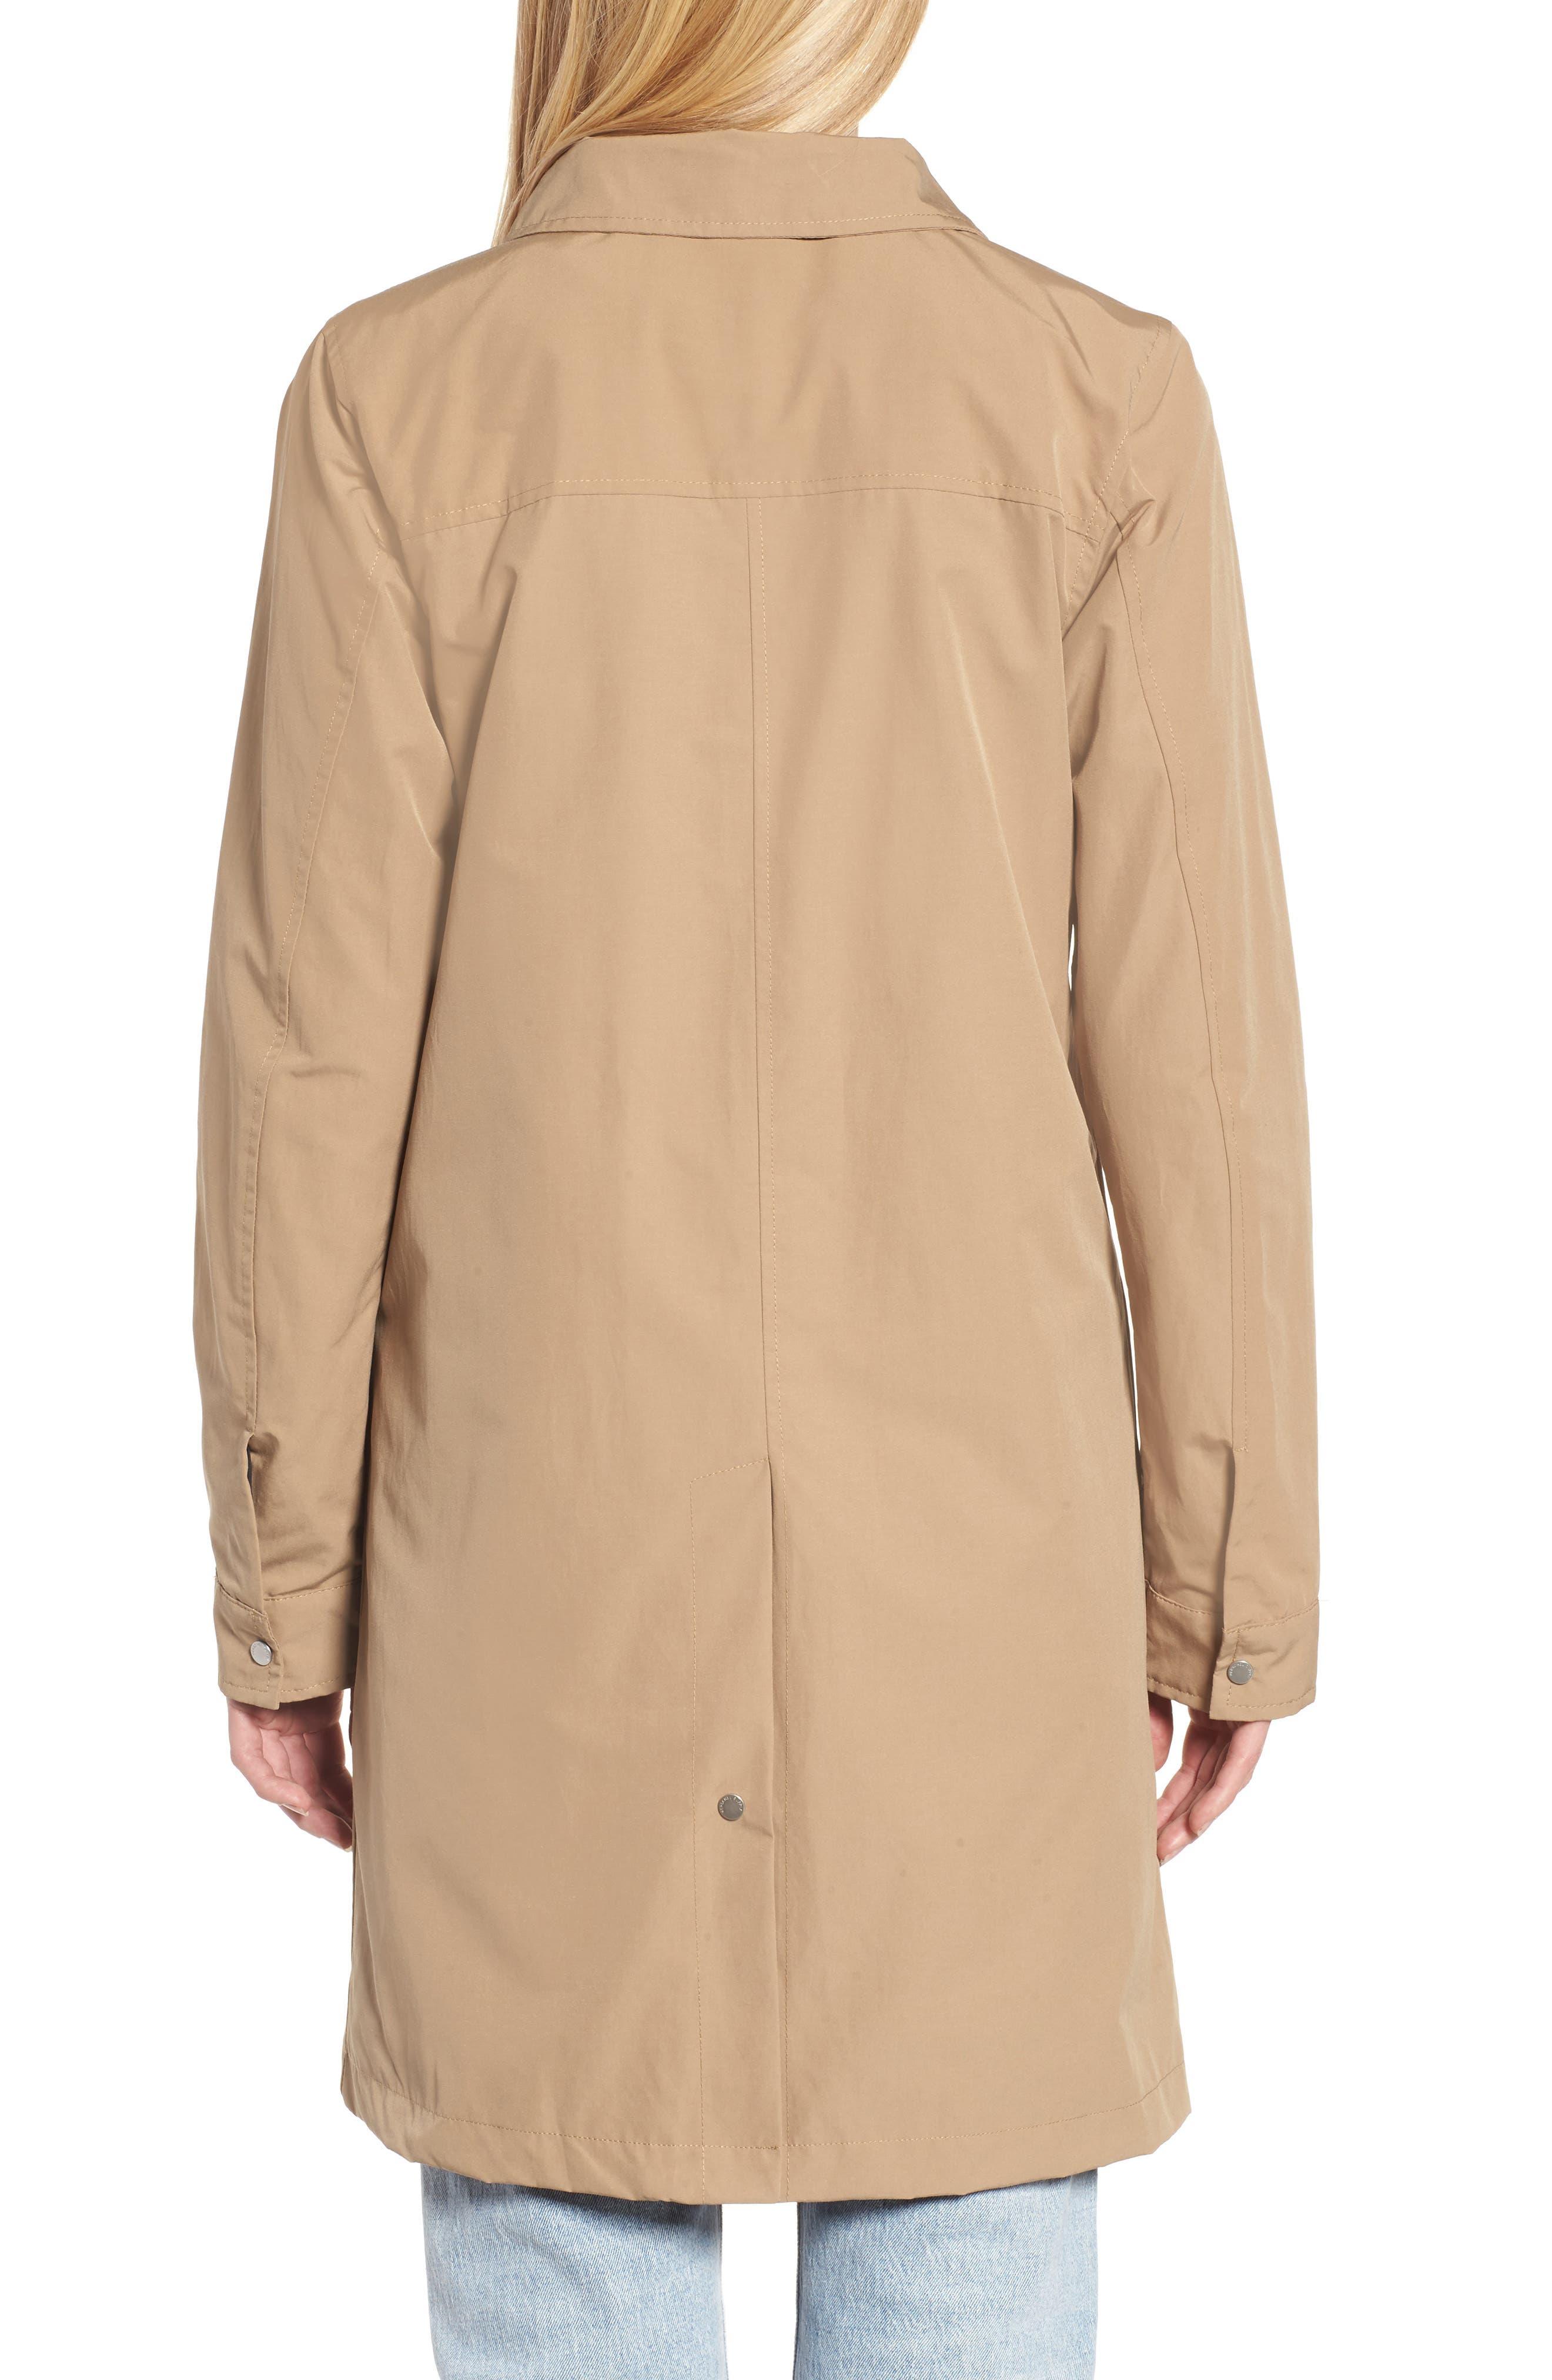 Mac Jacket,                             Alternate thumbnail 2, color,                             250